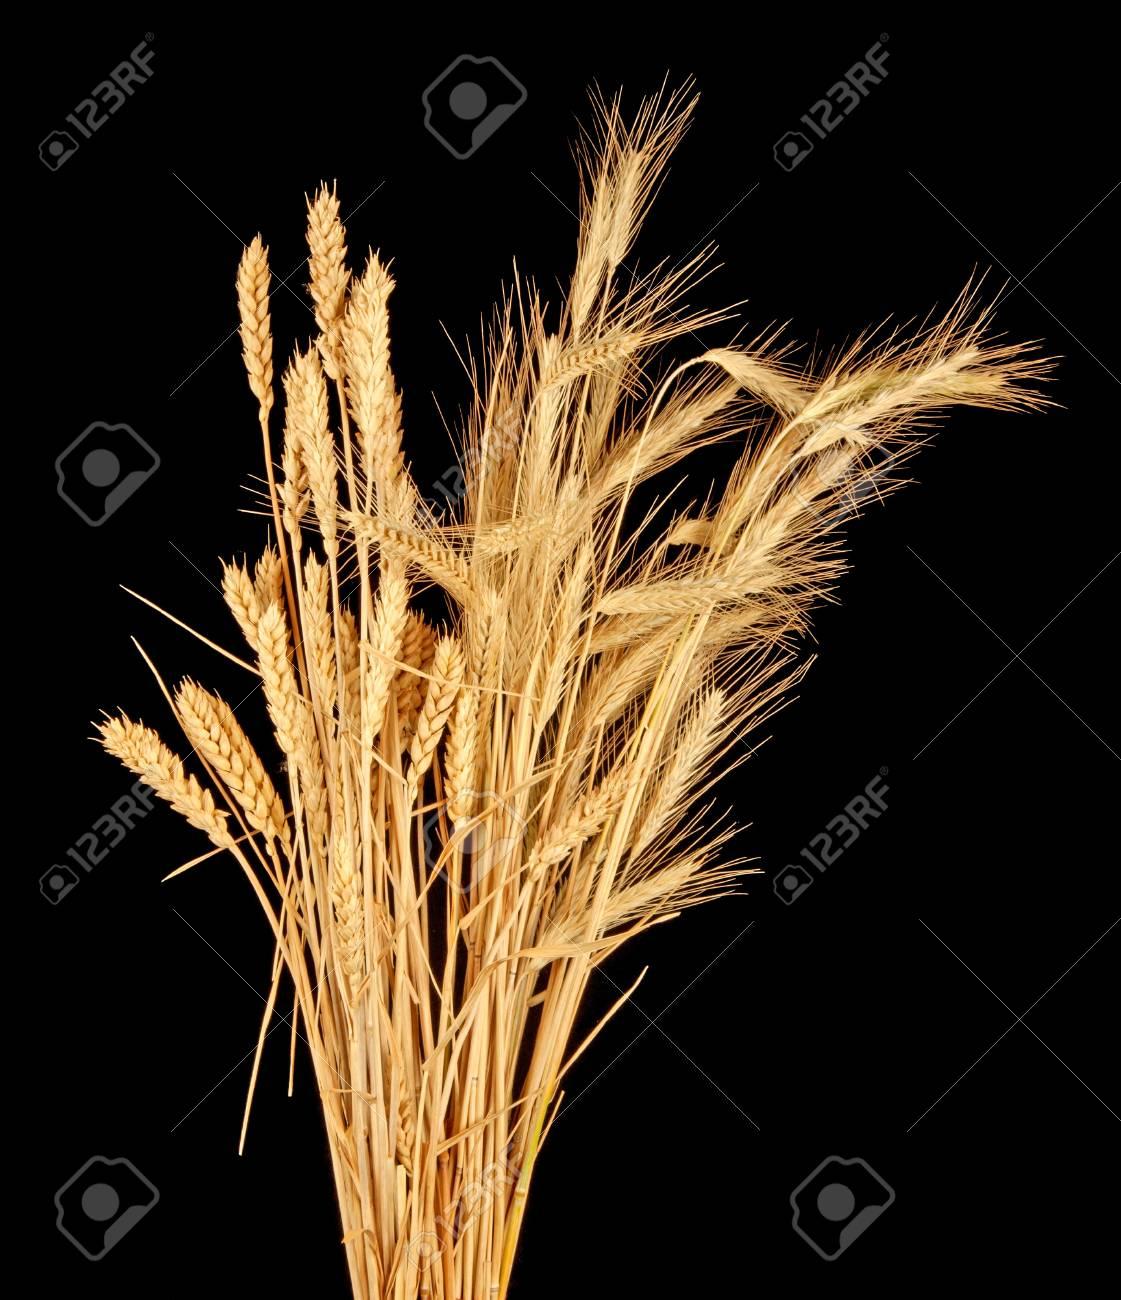 wisp of wheat and rye Stock Photo - 13012114